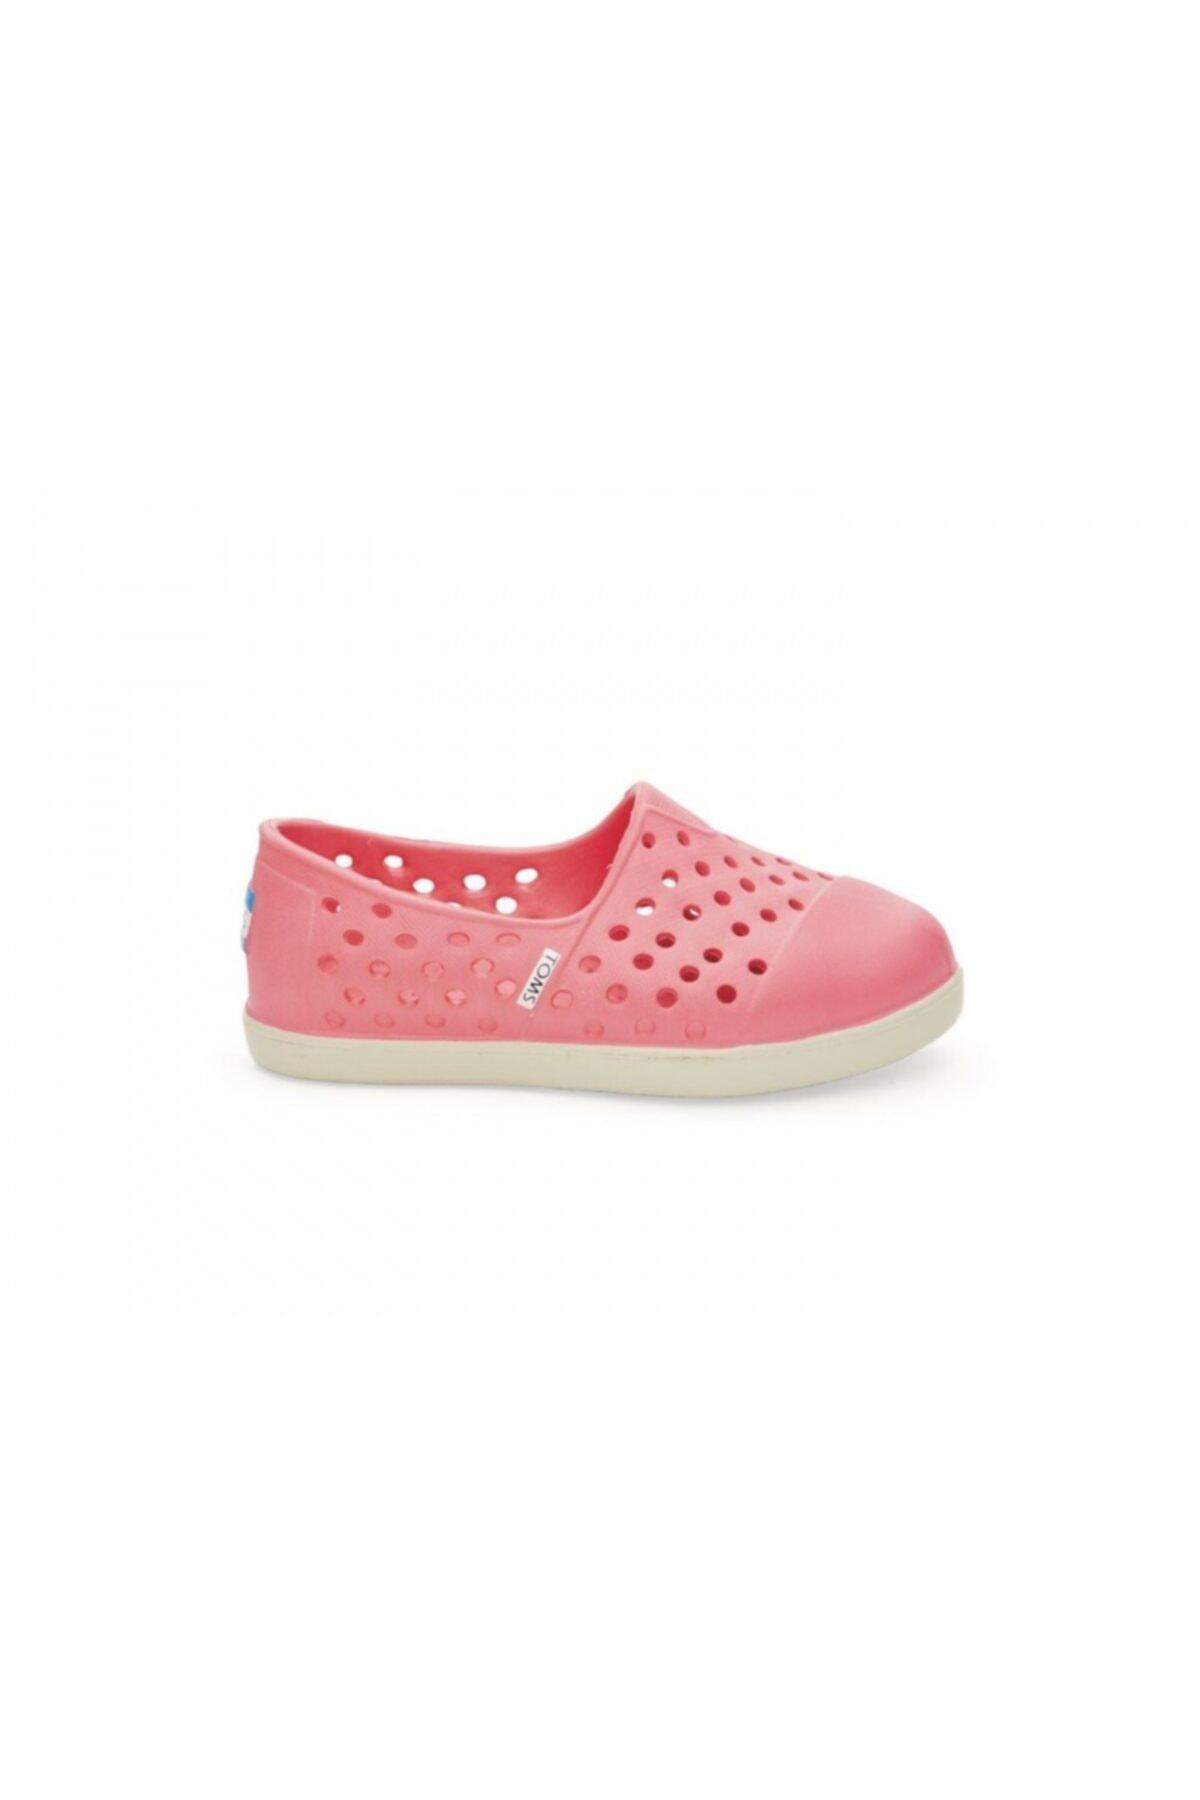 Toms Deniz Terliği Romper Pink 1